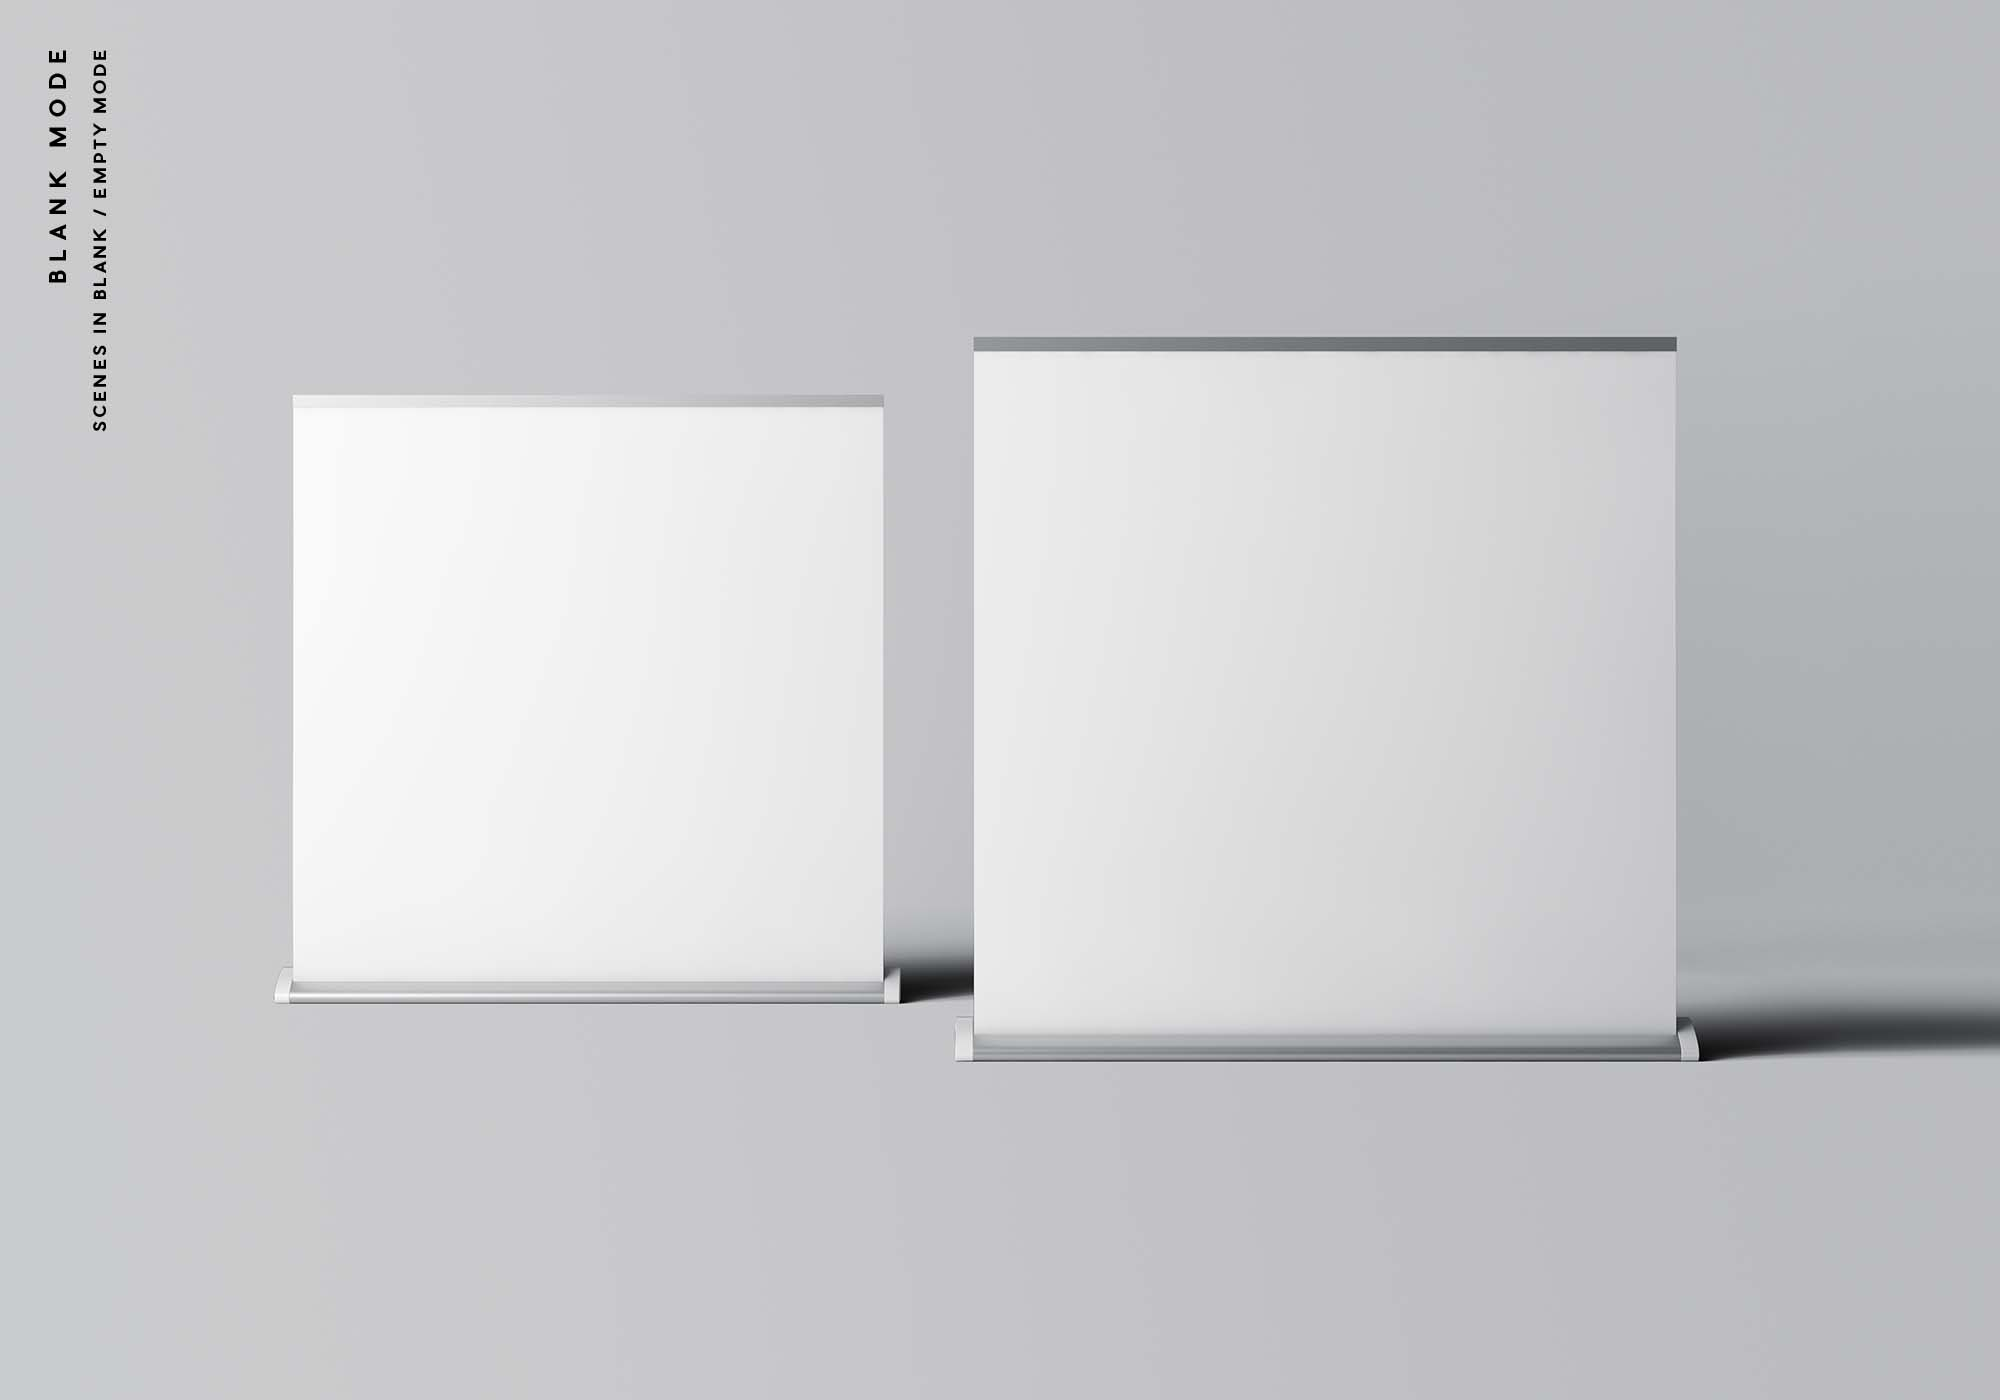 Wide Rollup Mockup - Blank Mode